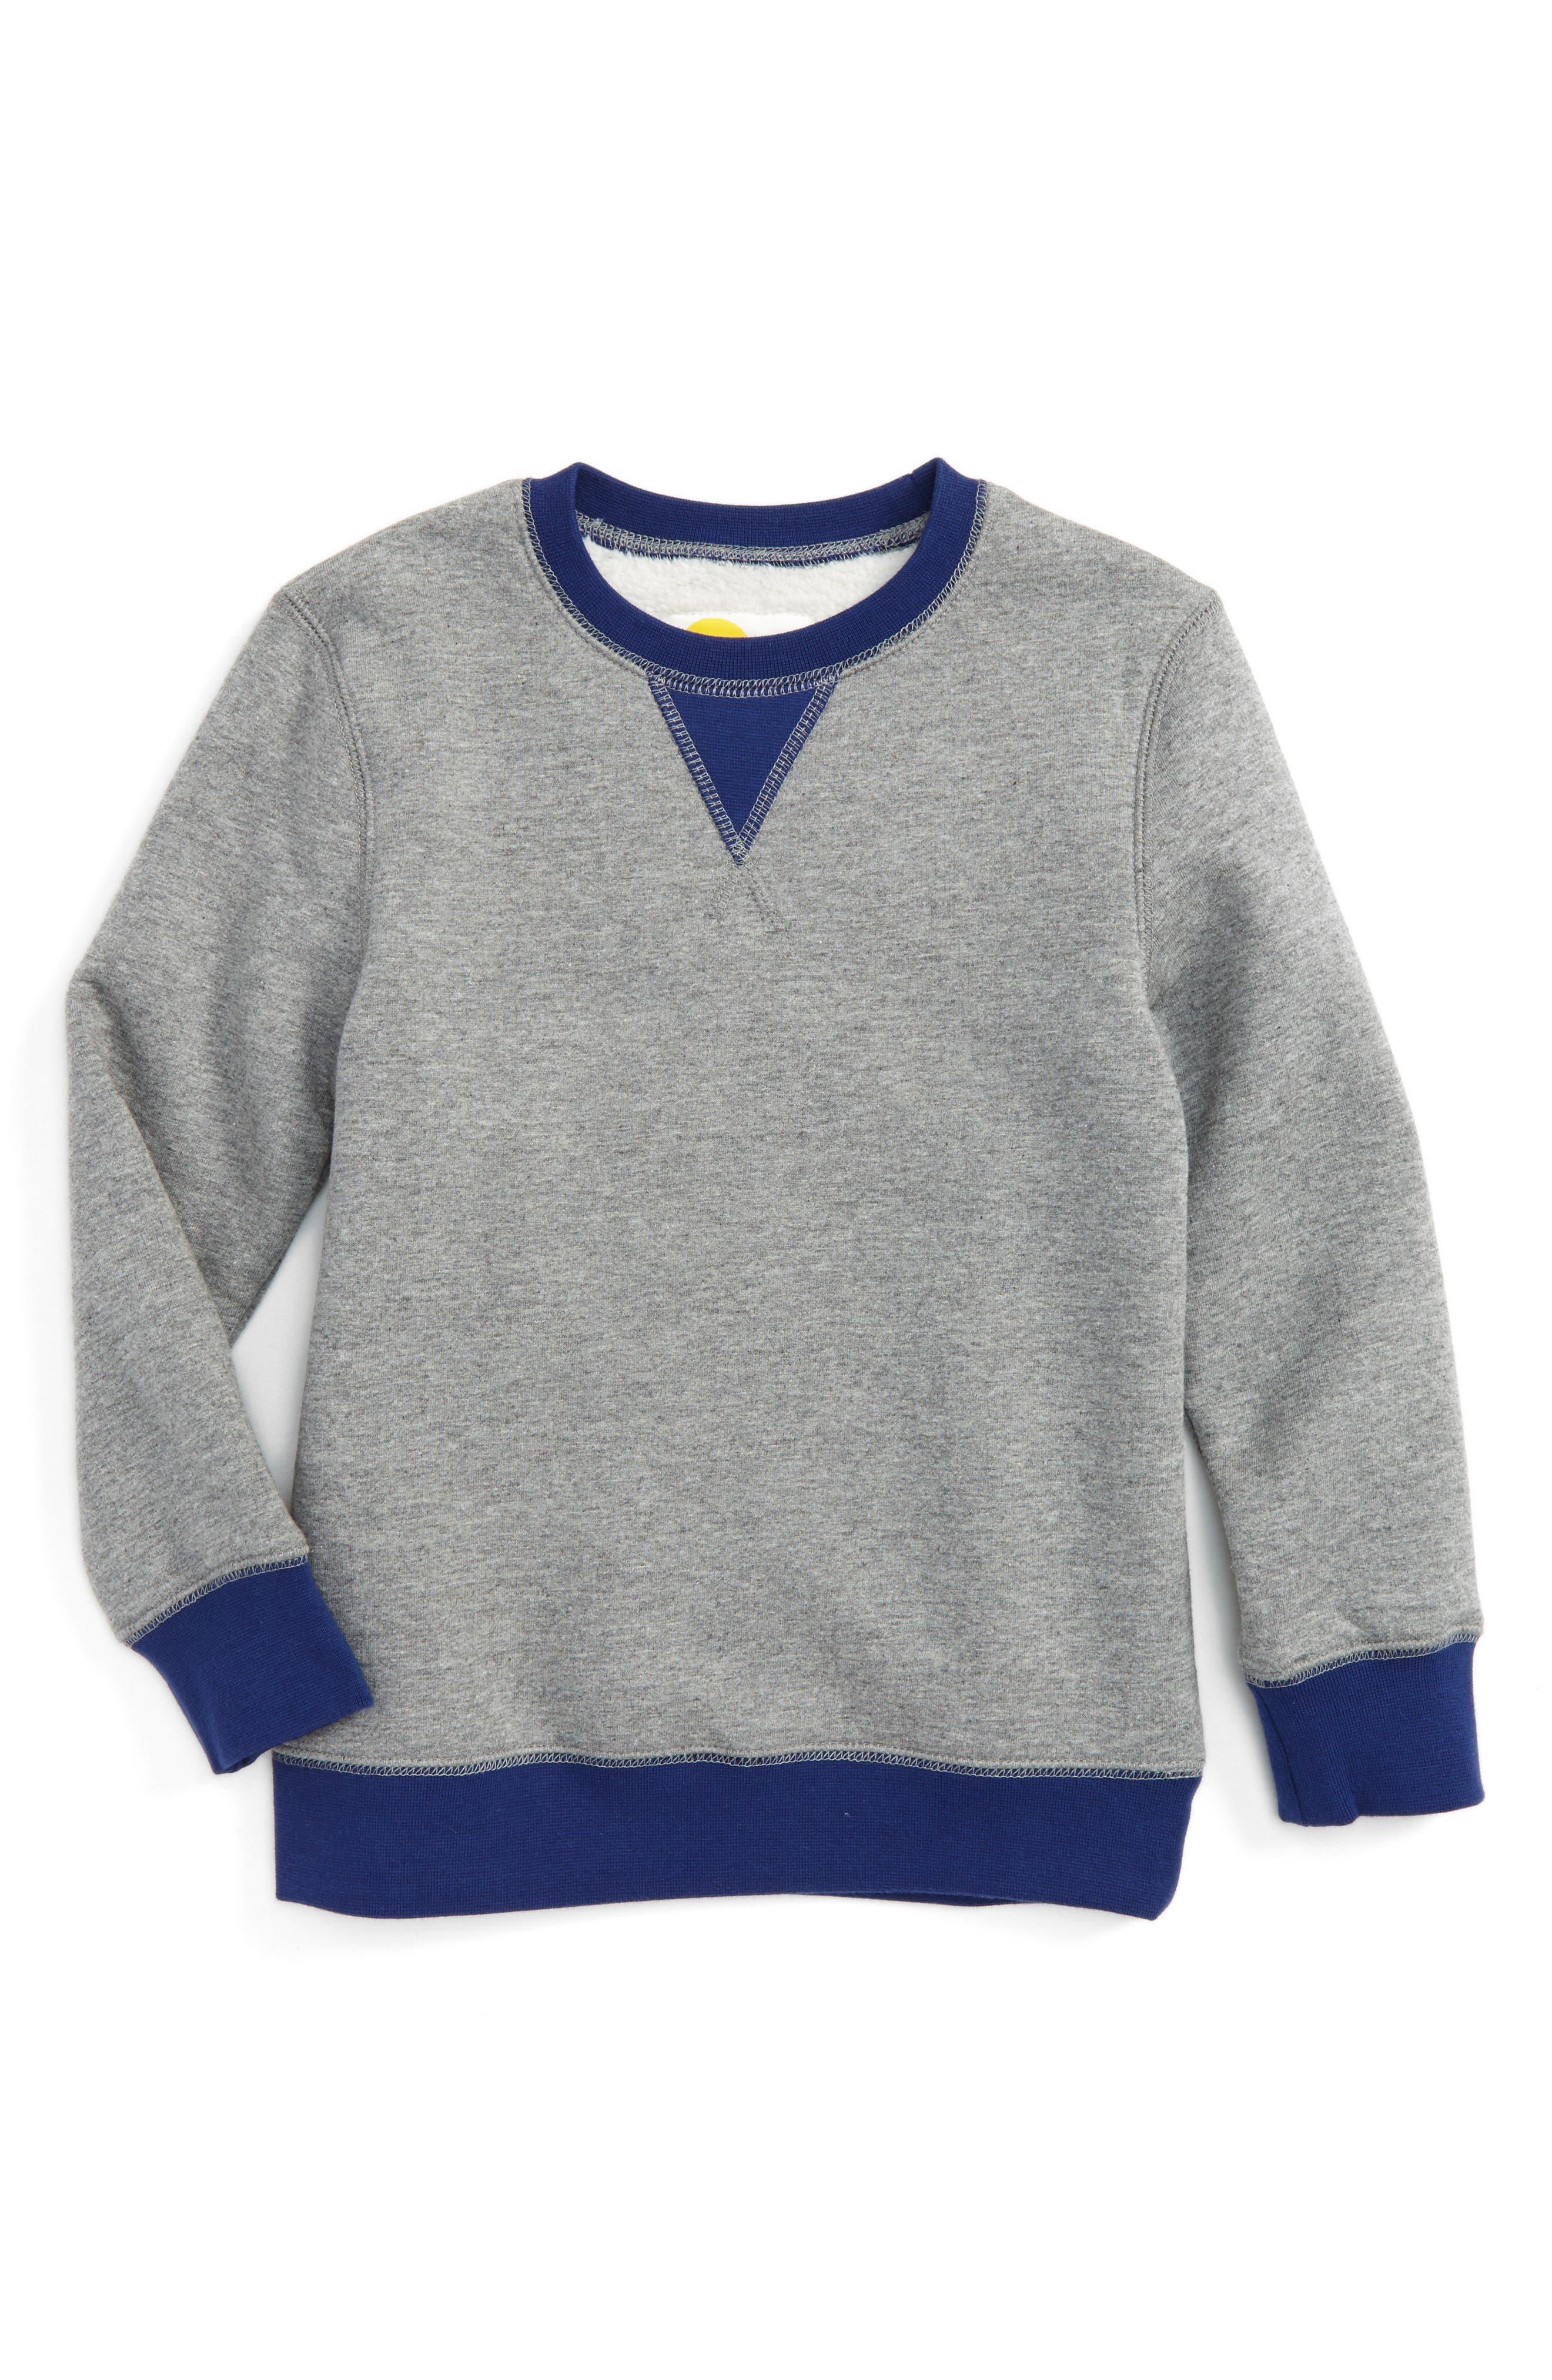 Main Image - Mini Boden Shaggy Lined Sweatshirt (Little Boys & Big Boys)